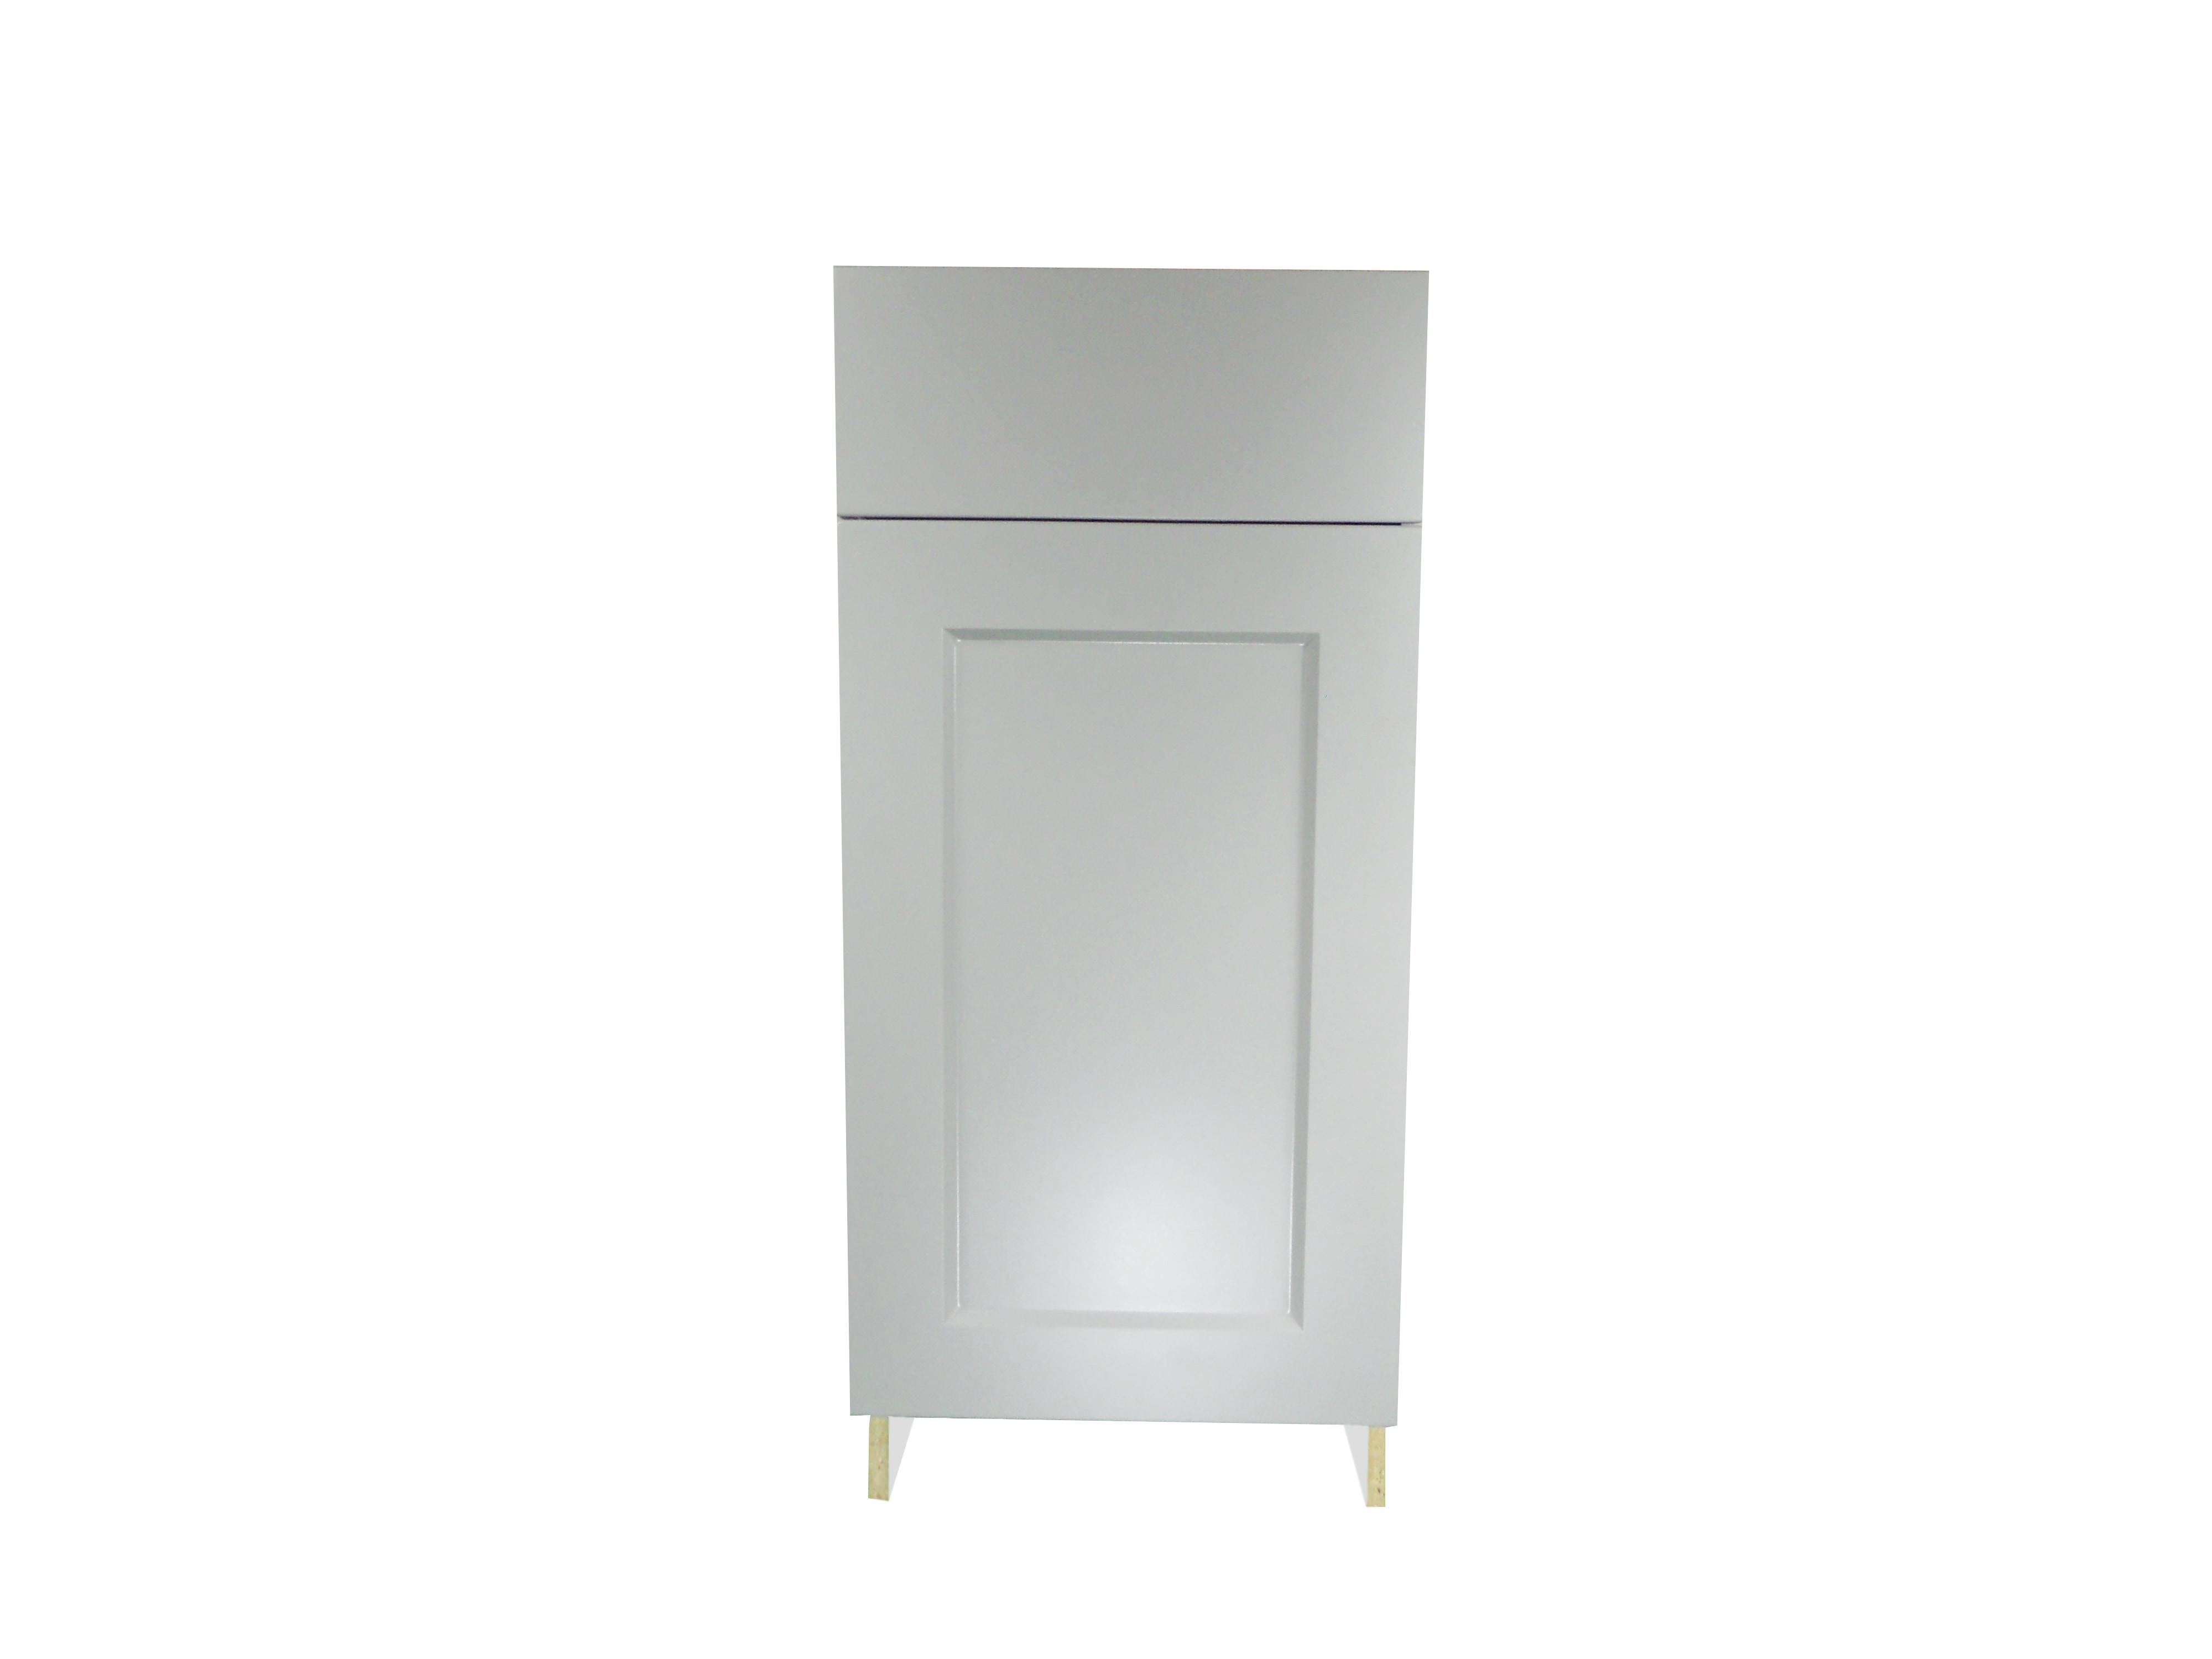 Base Cabinet with Drawer/Door / Whistler Grey / Flat Panel Grey / 15 Whistler Grey 0